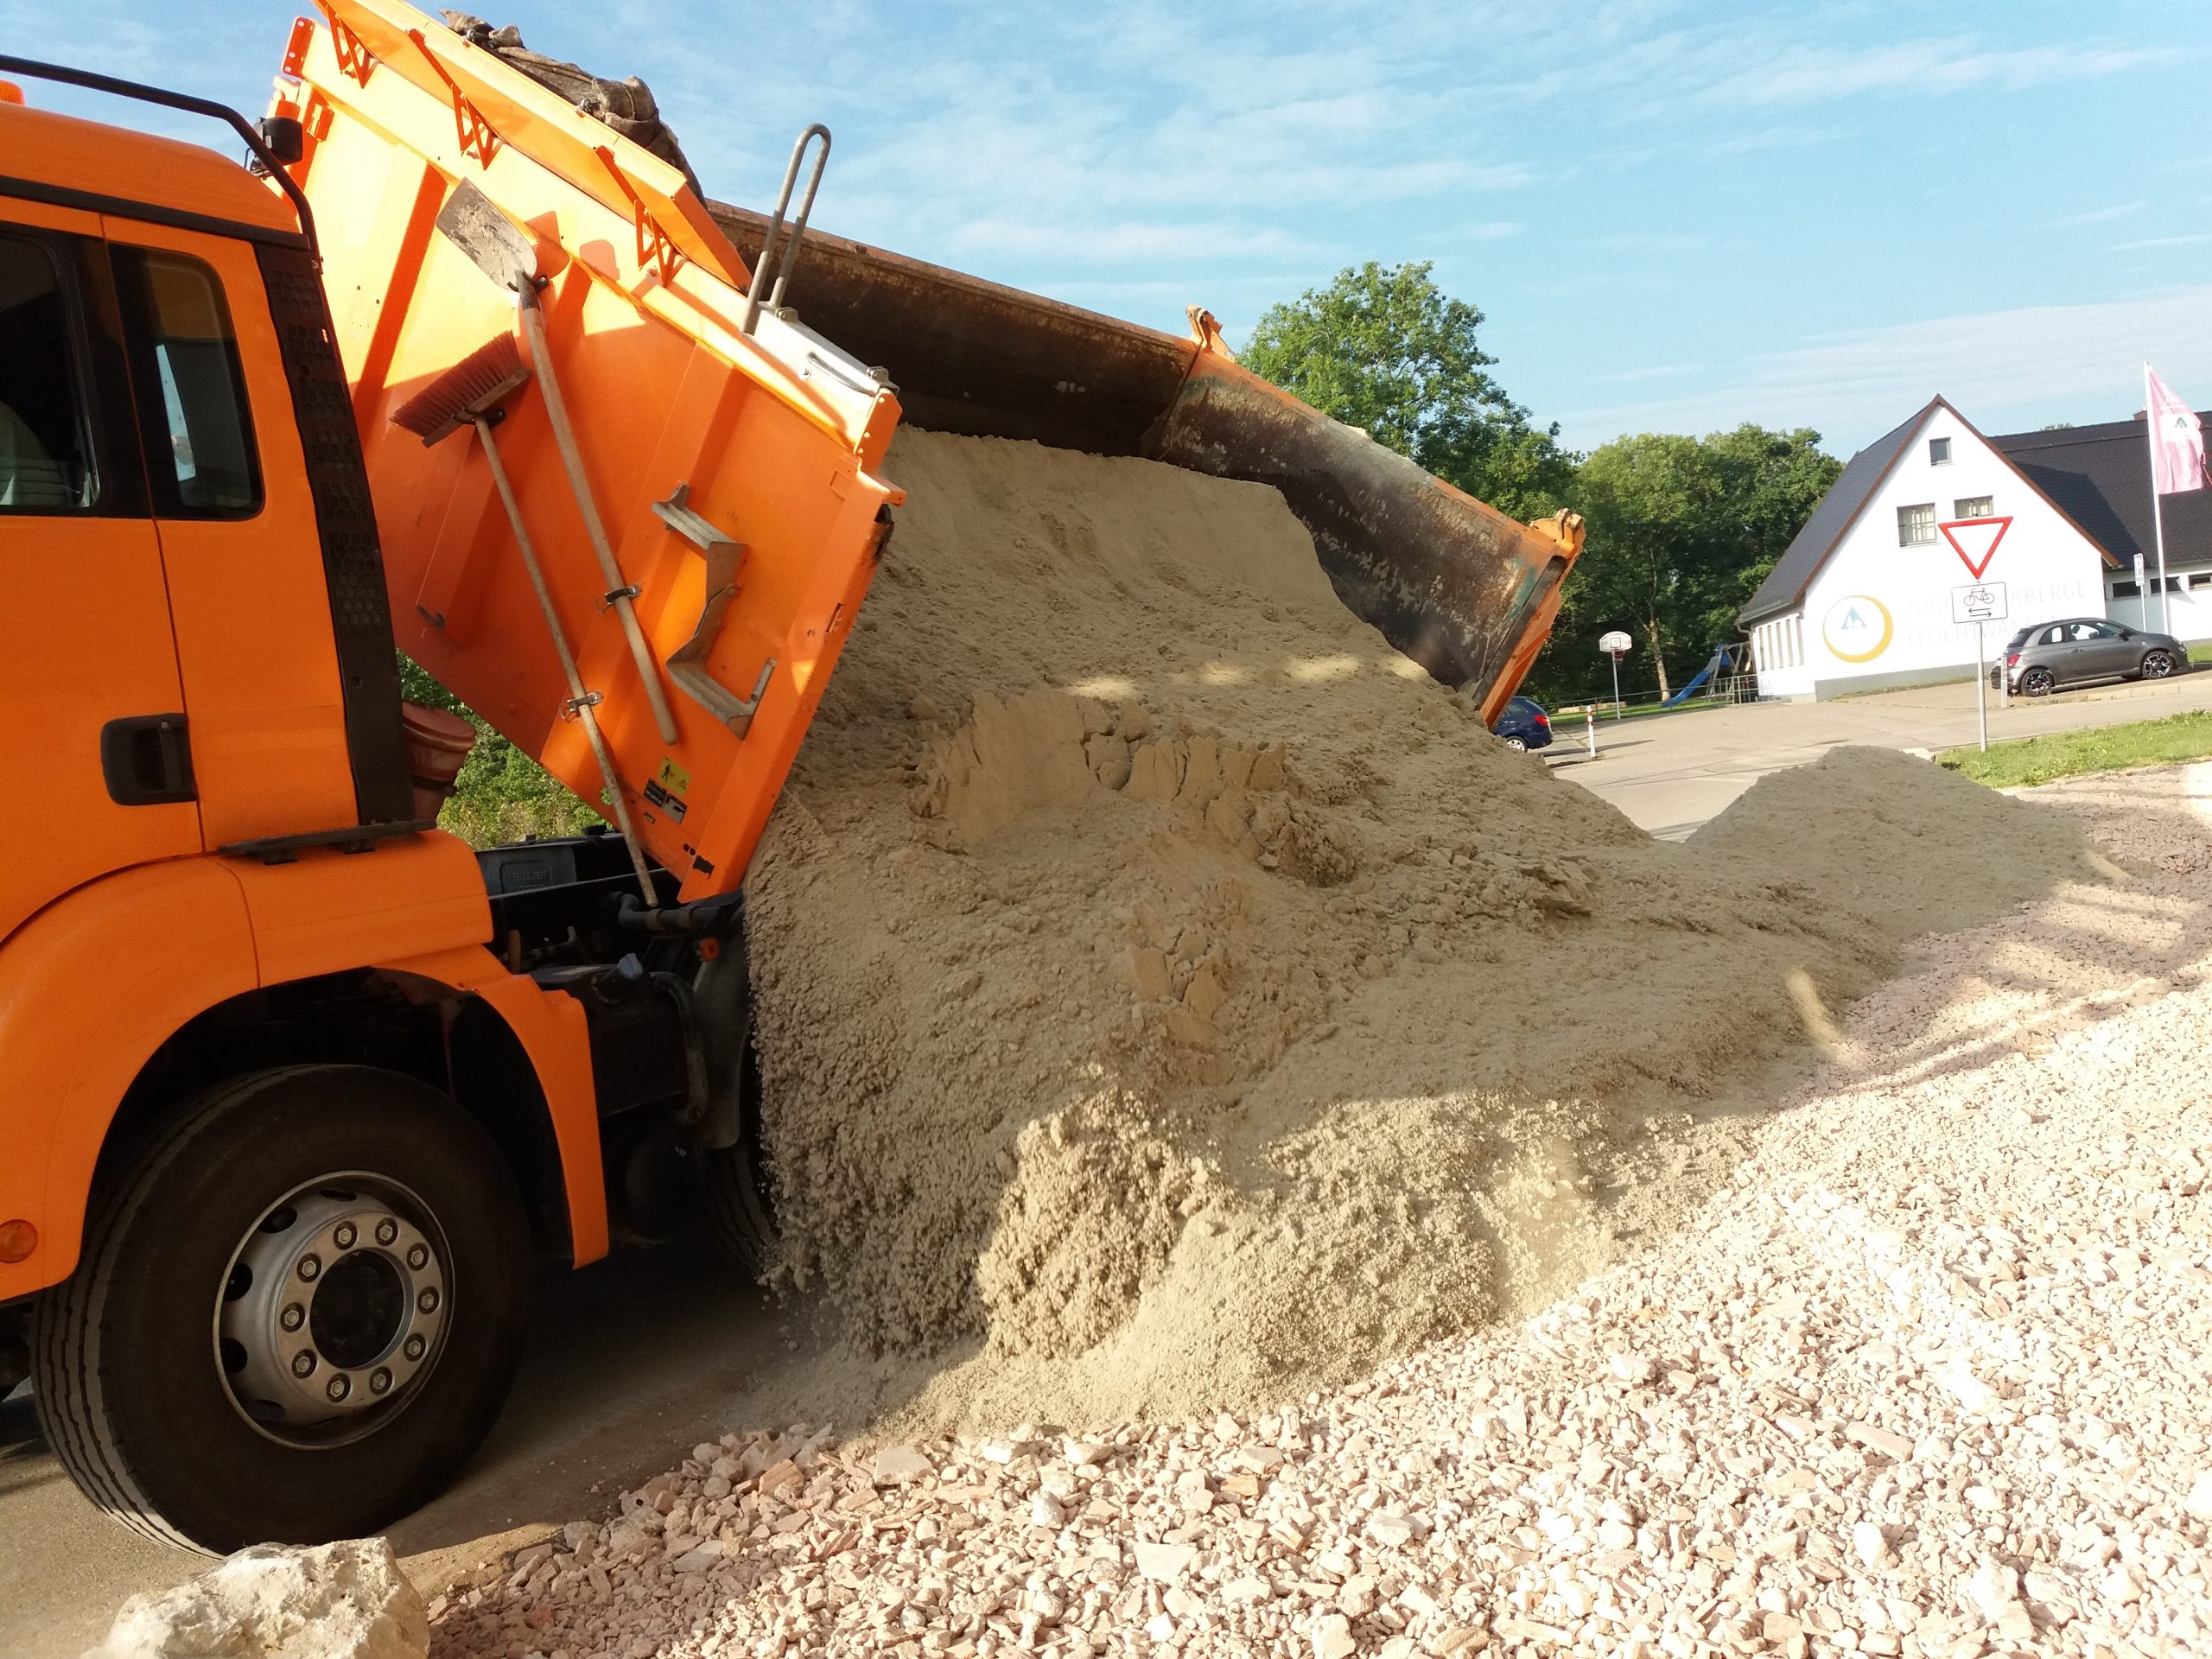 Anlieferung Auslieferung Erde Sand Betonsand Mineralbeton Dreiachser Berufskraftfahrer